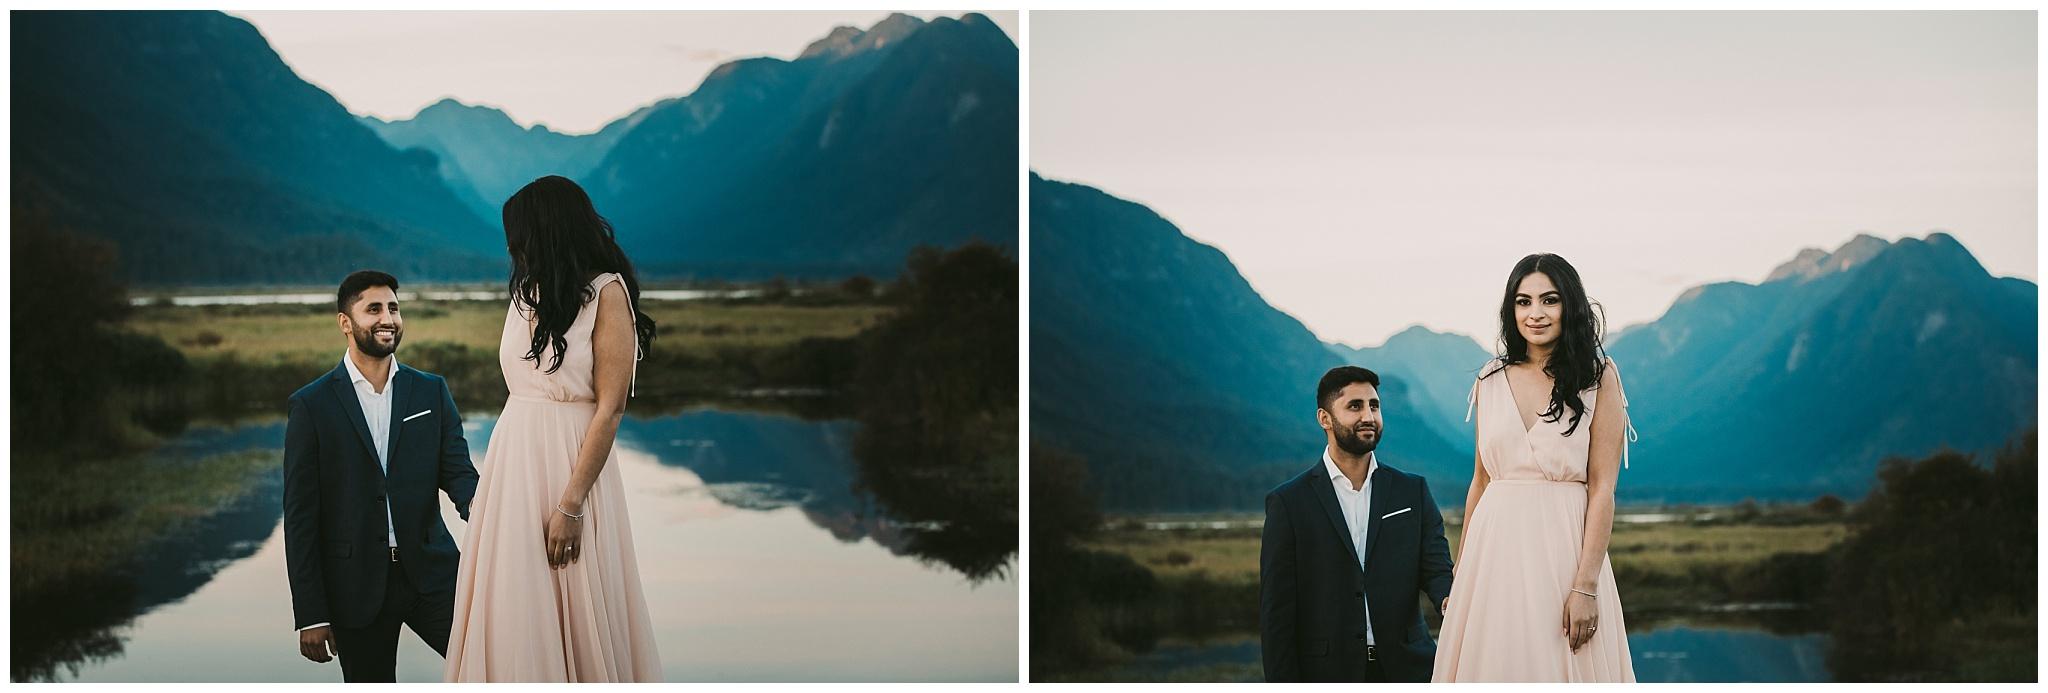 Maple-Ridge-Engagement-Photographer-10.jpg